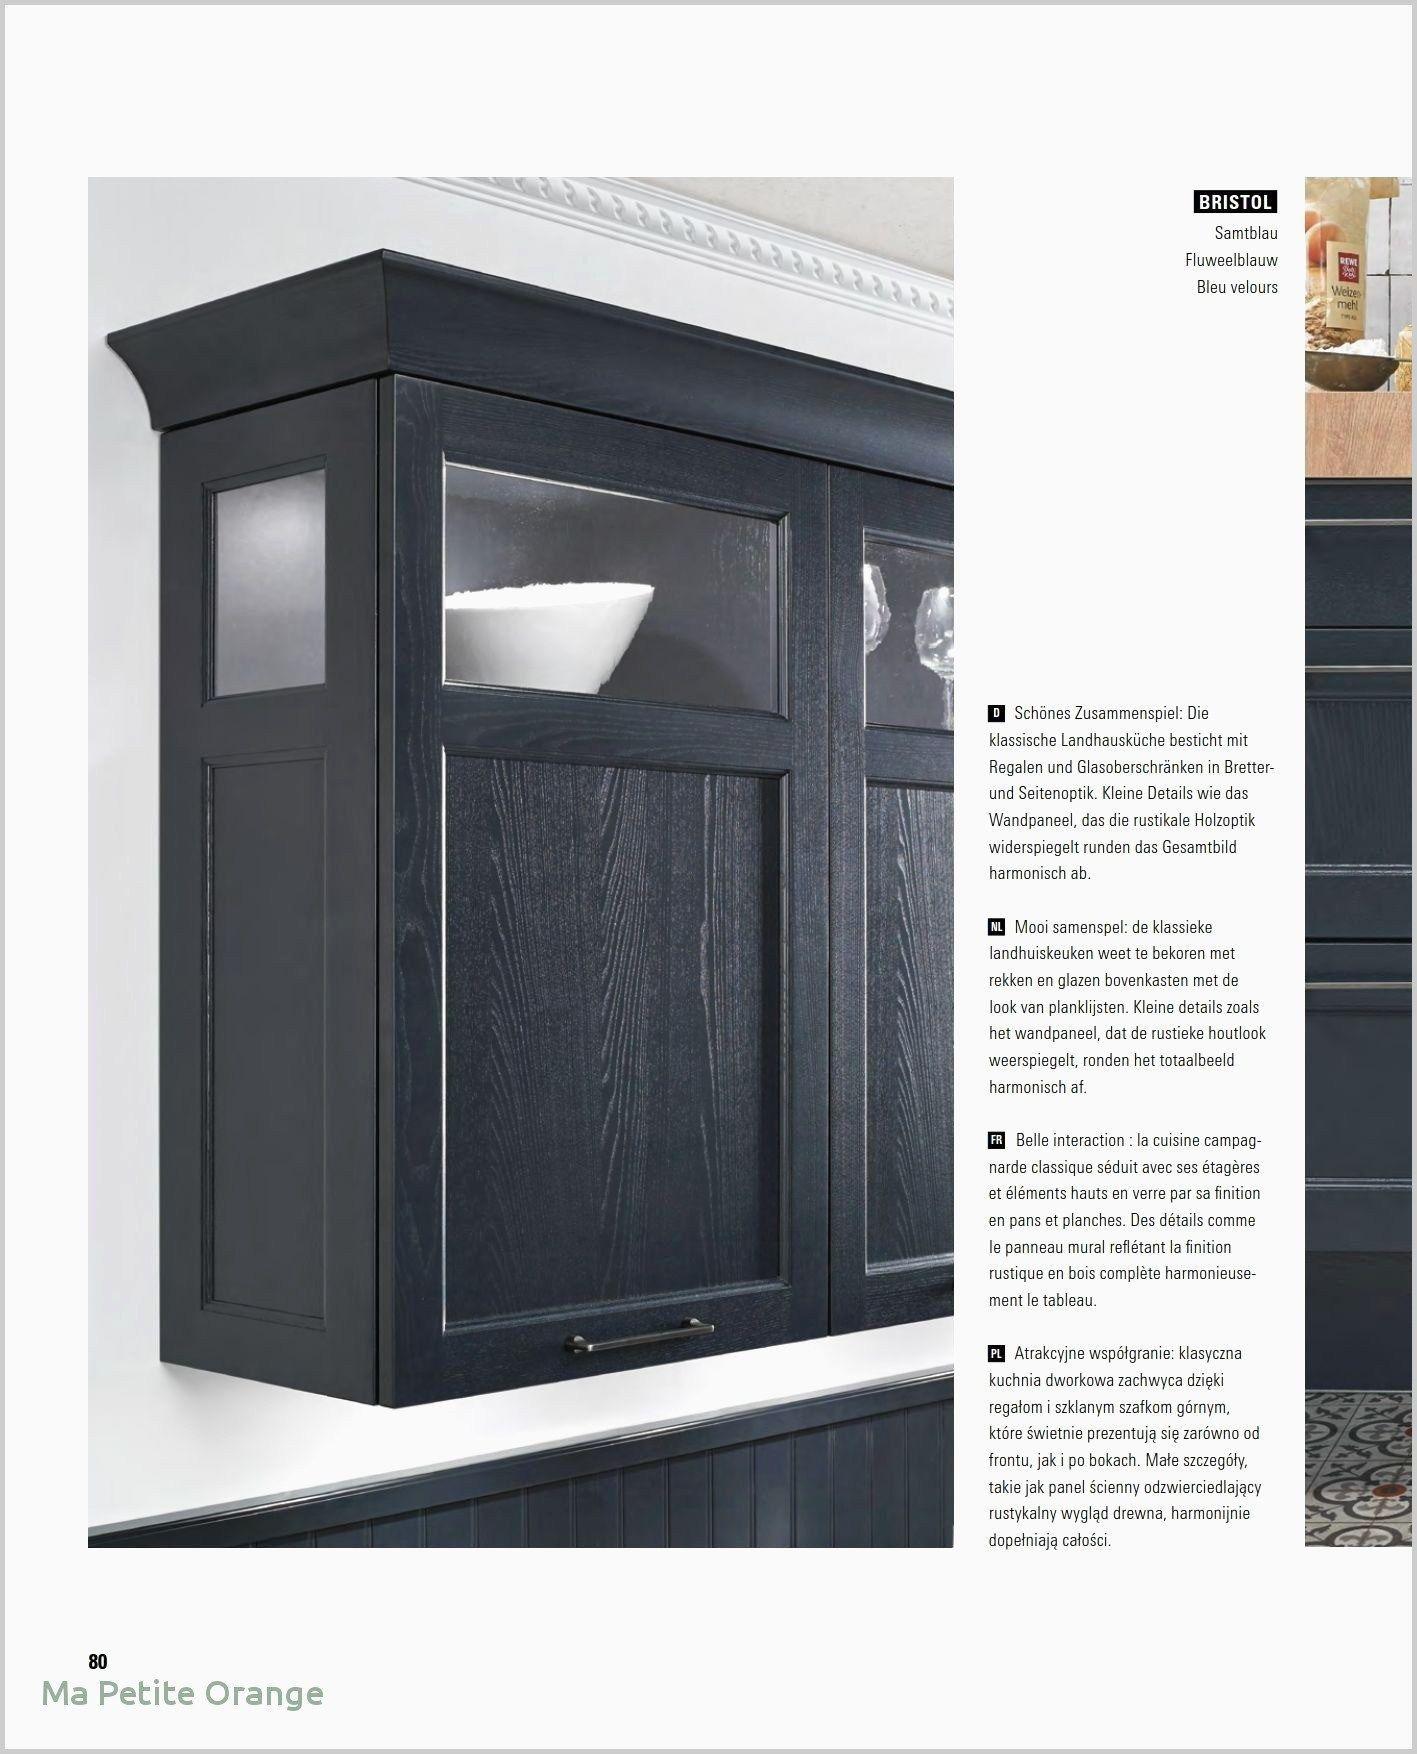 Meilleur Element Haut Cuisine Ikea Locker Storage Diy Bathroom